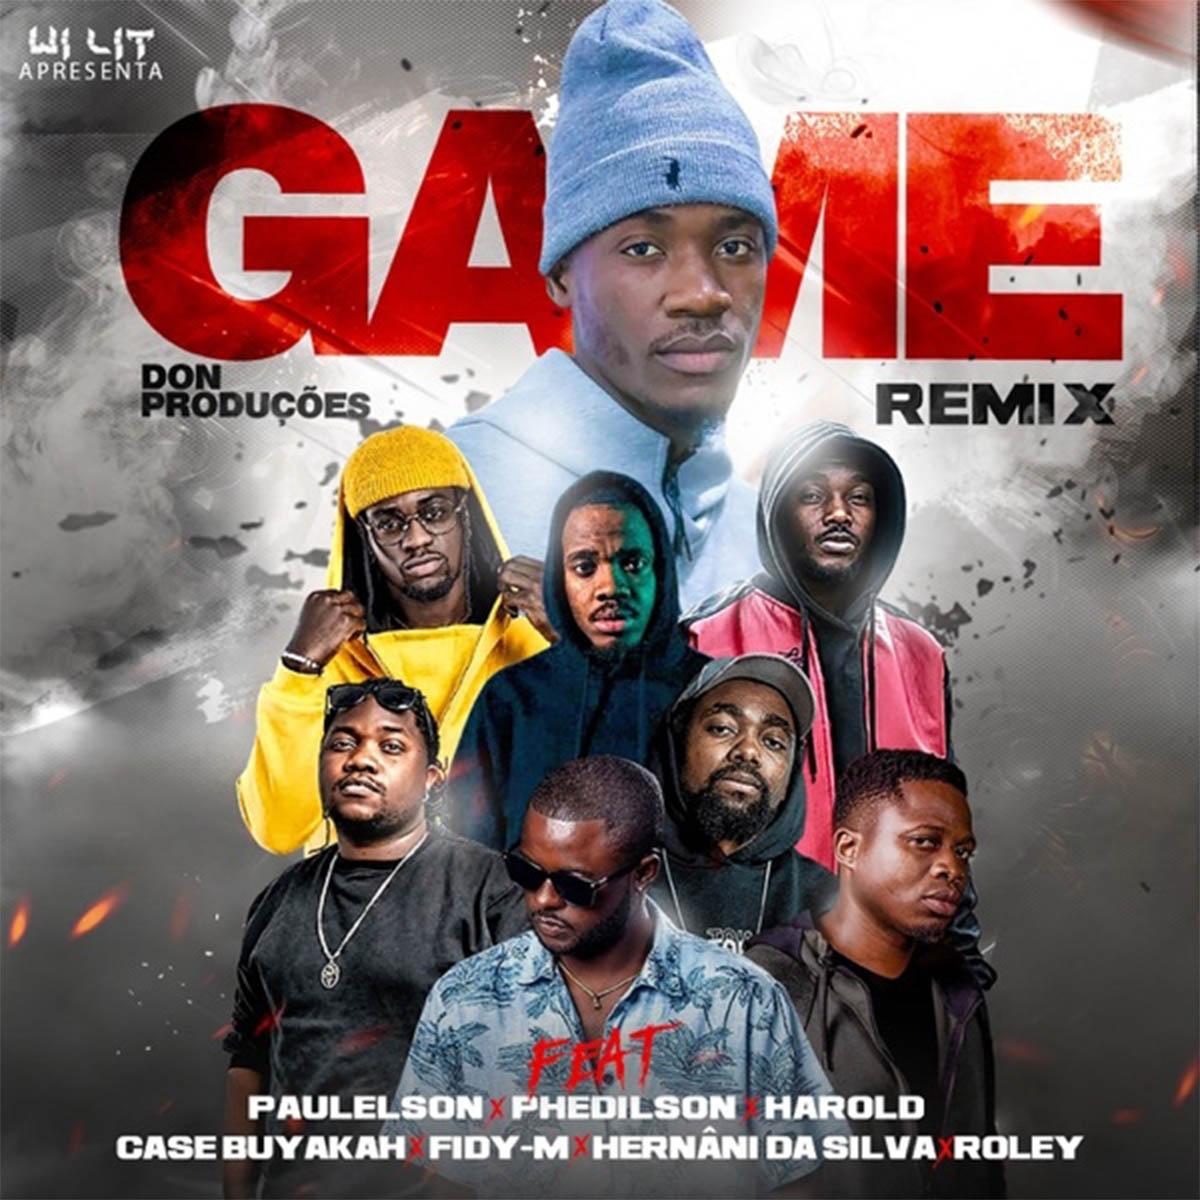 Don Produções – Game (Remix) [feat. Paulelson, Phedilson, Harold, Case Buyakah, Fidy-M, Hernâni da Silva & Roley]